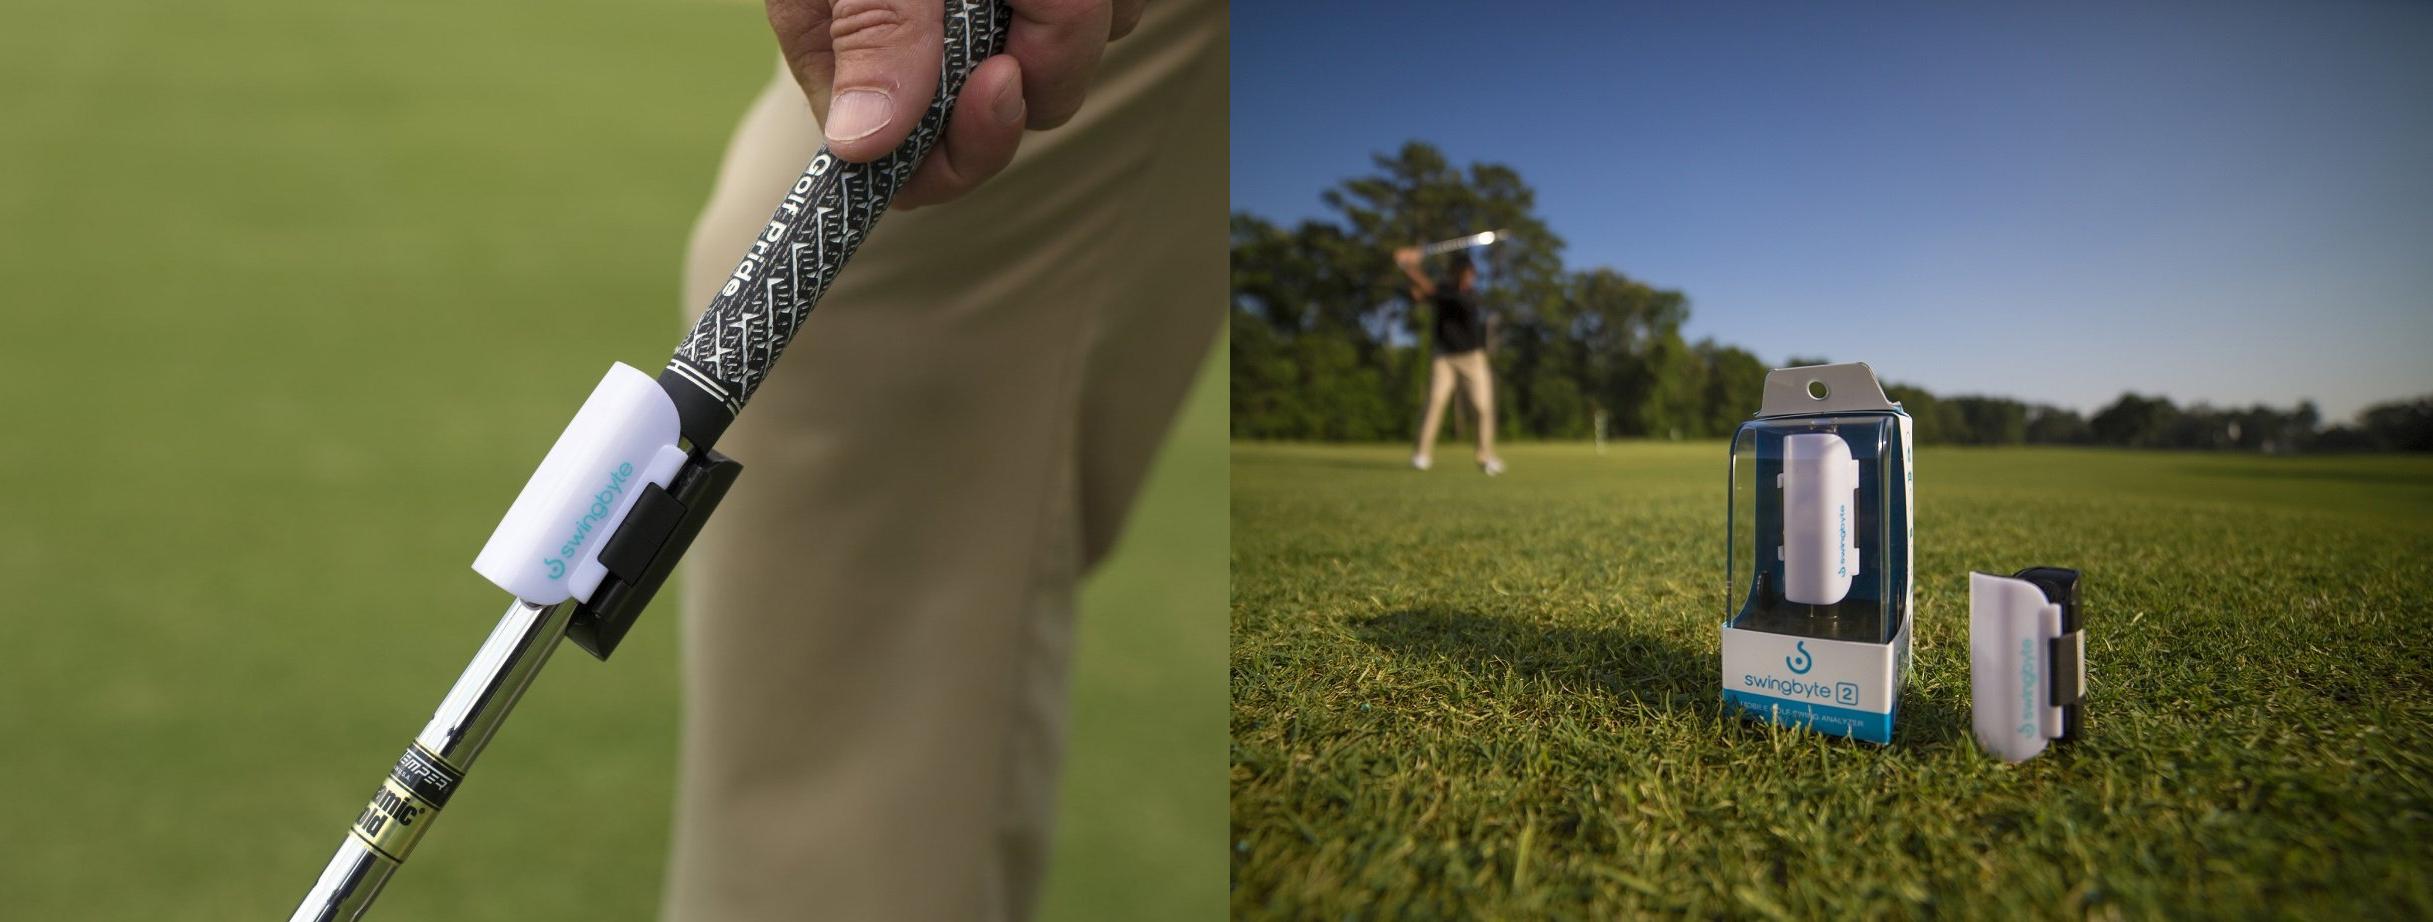 best sports gadget Swingbyte 2 Golf Swing Analyzer